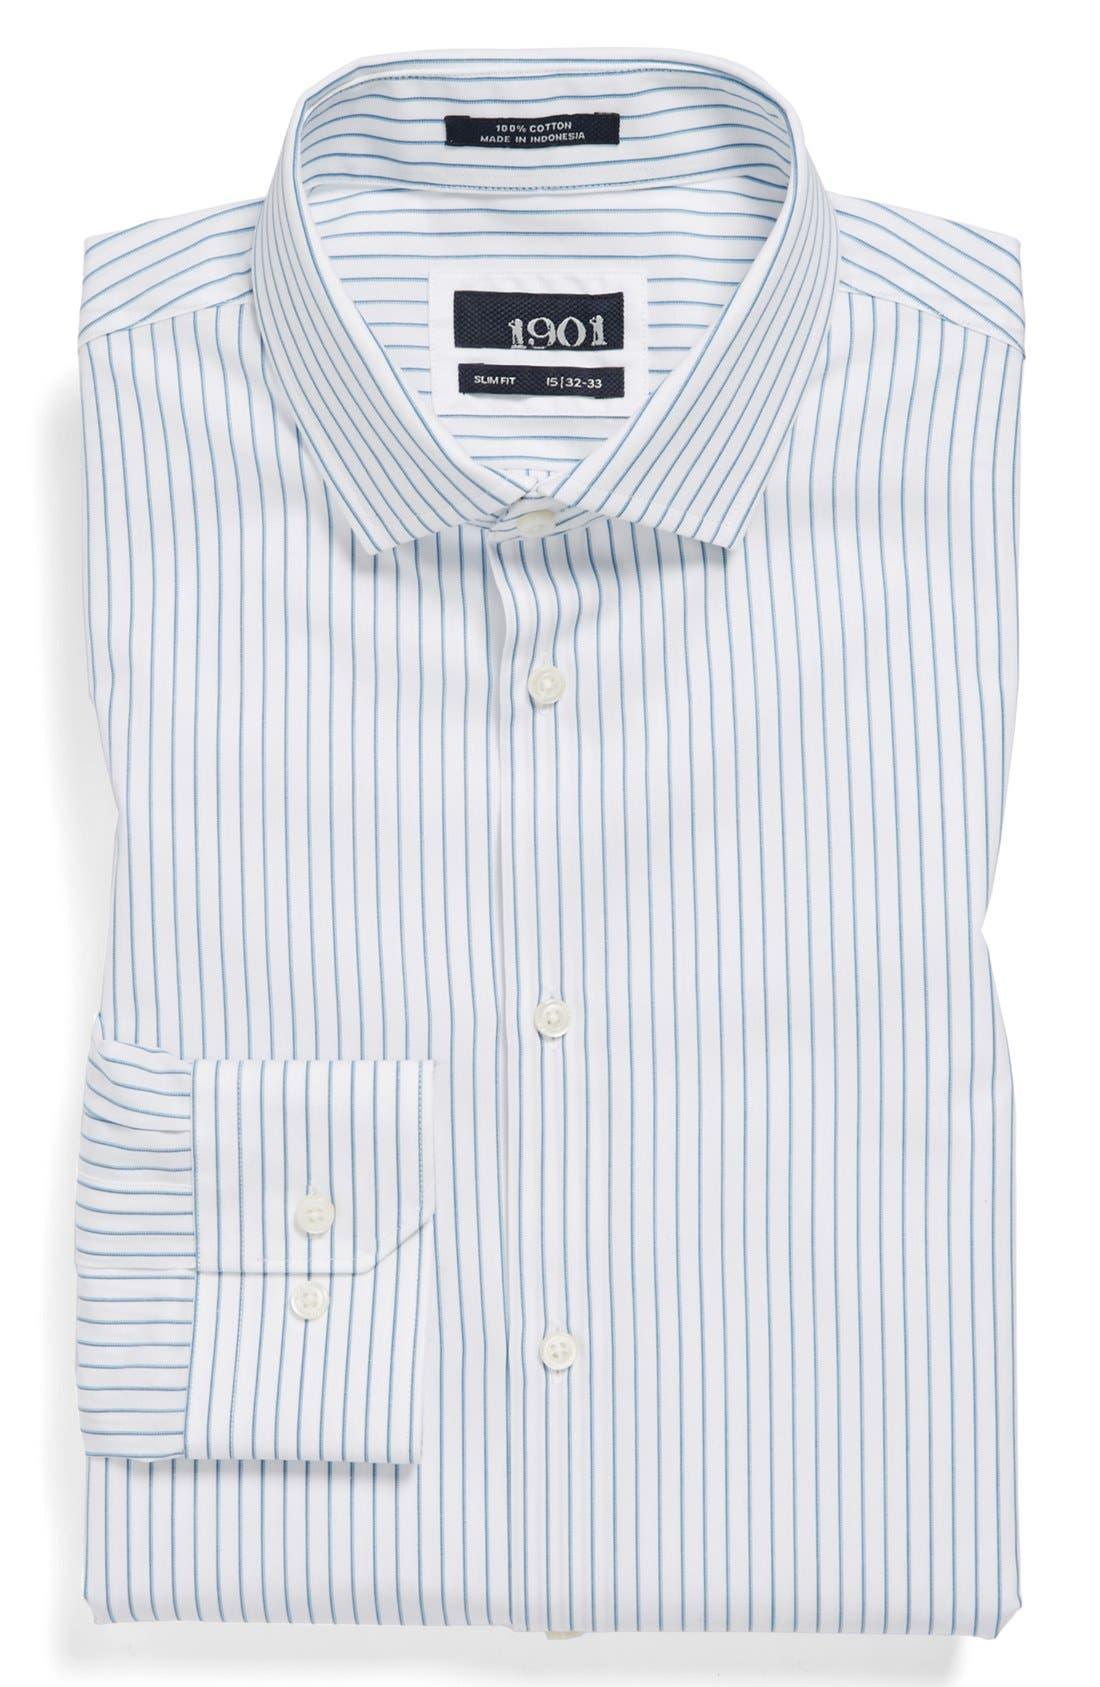 Alternate Image 1 Selected - 1901 Slim Fit Stripe Dress Shirt